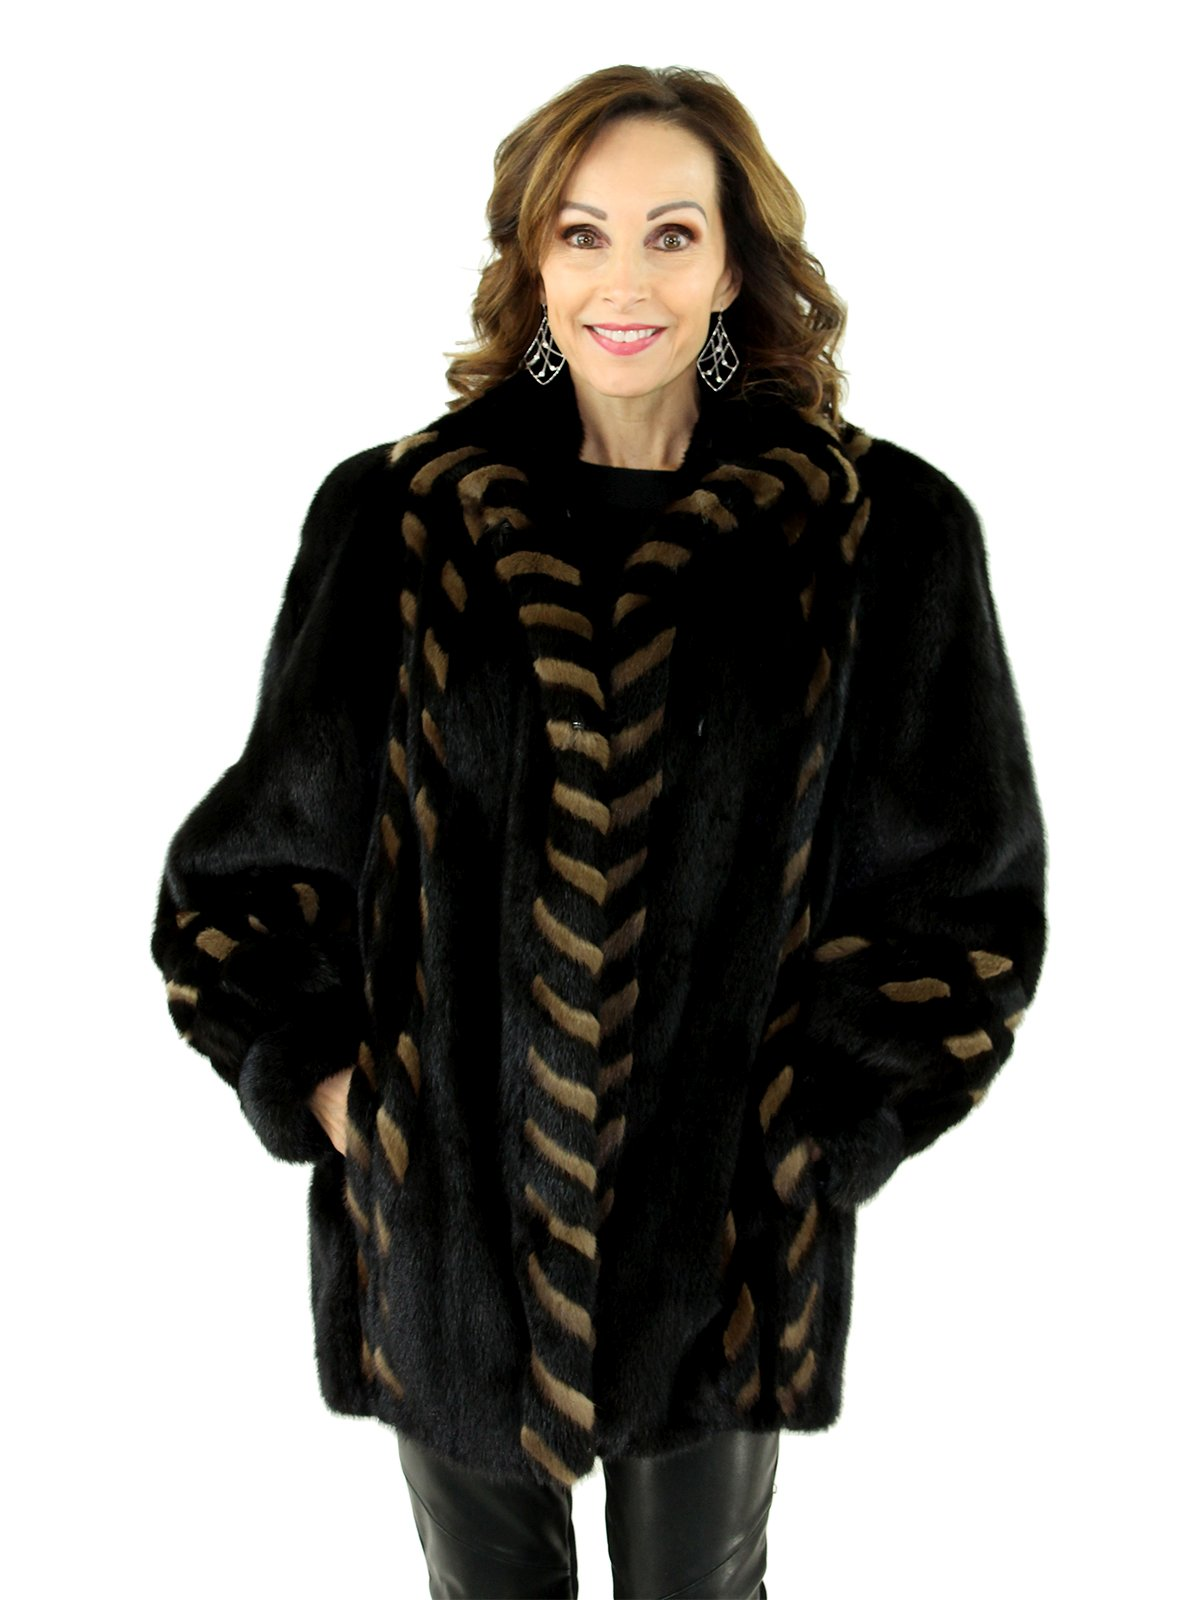 3850aea3d1d1 Ranch Mink Fur Jacket Reversible to Black Leather - Women s Mink Fur ...